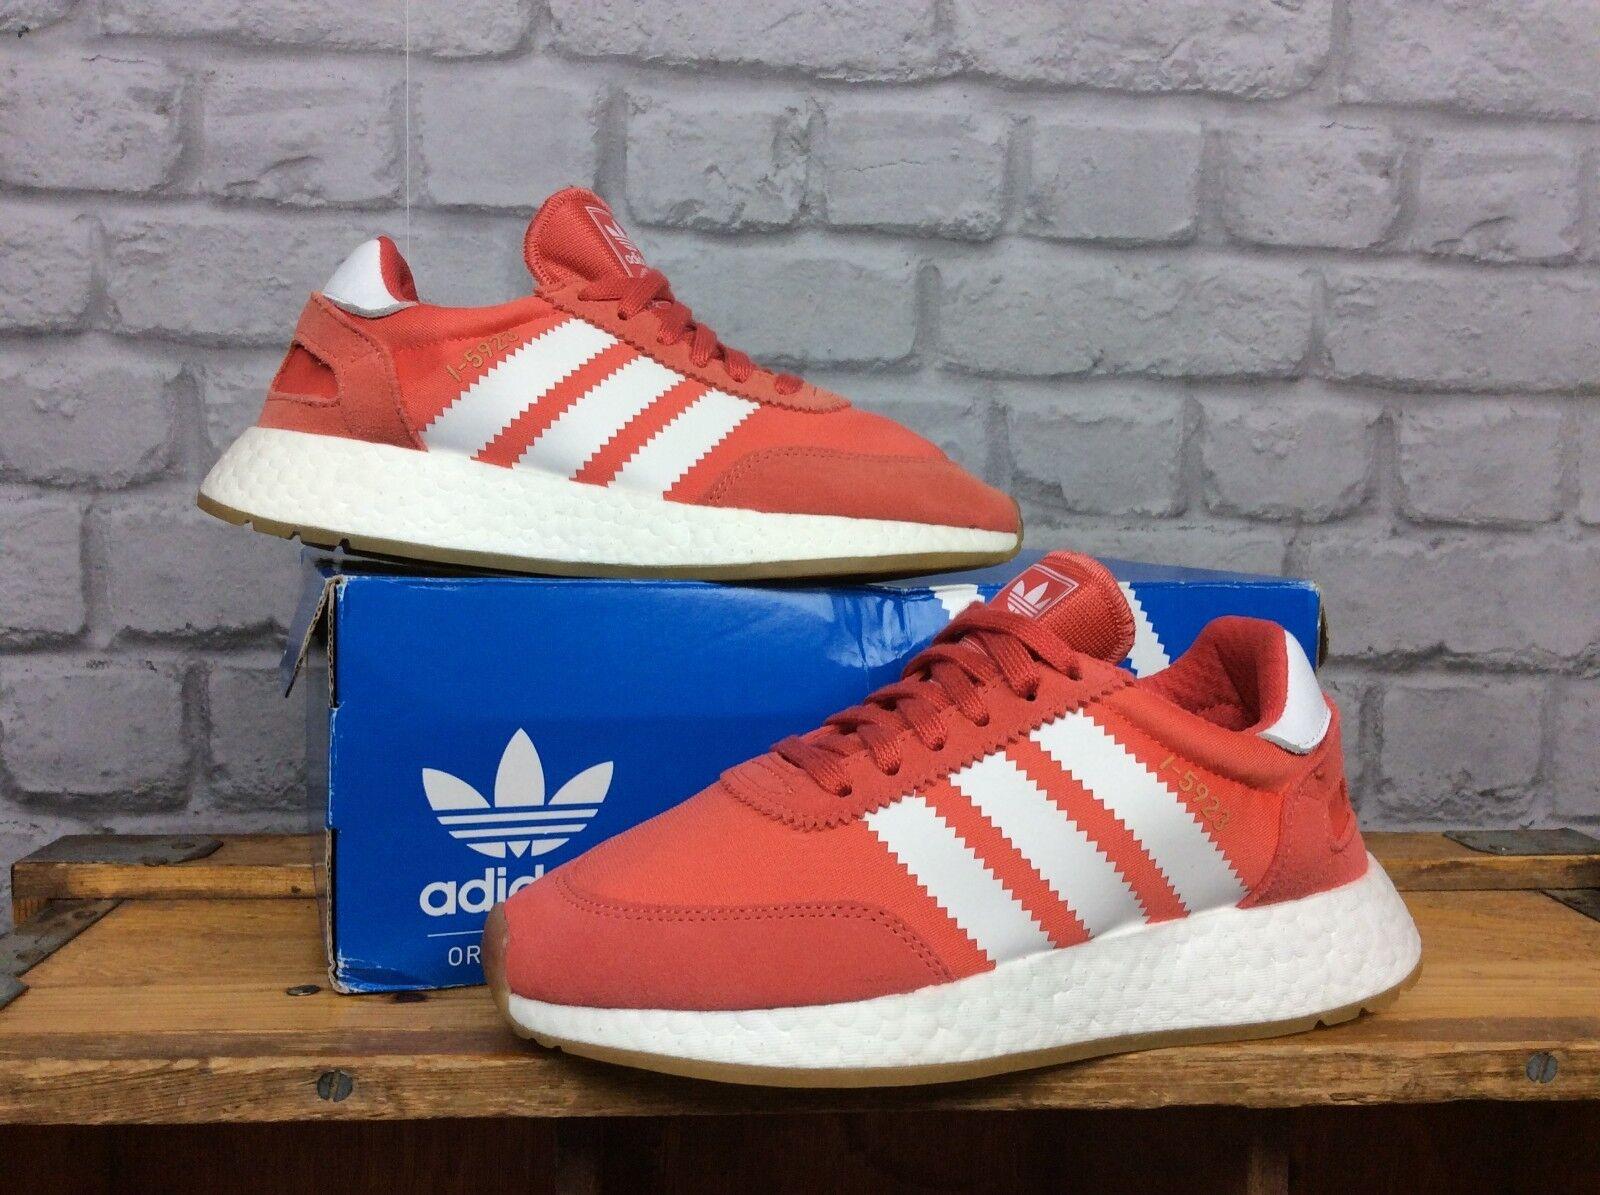 finest selection 5c5d1 8382e Adidas signore   3 rosso bianco gomma i-5923 i-5923 i-5923